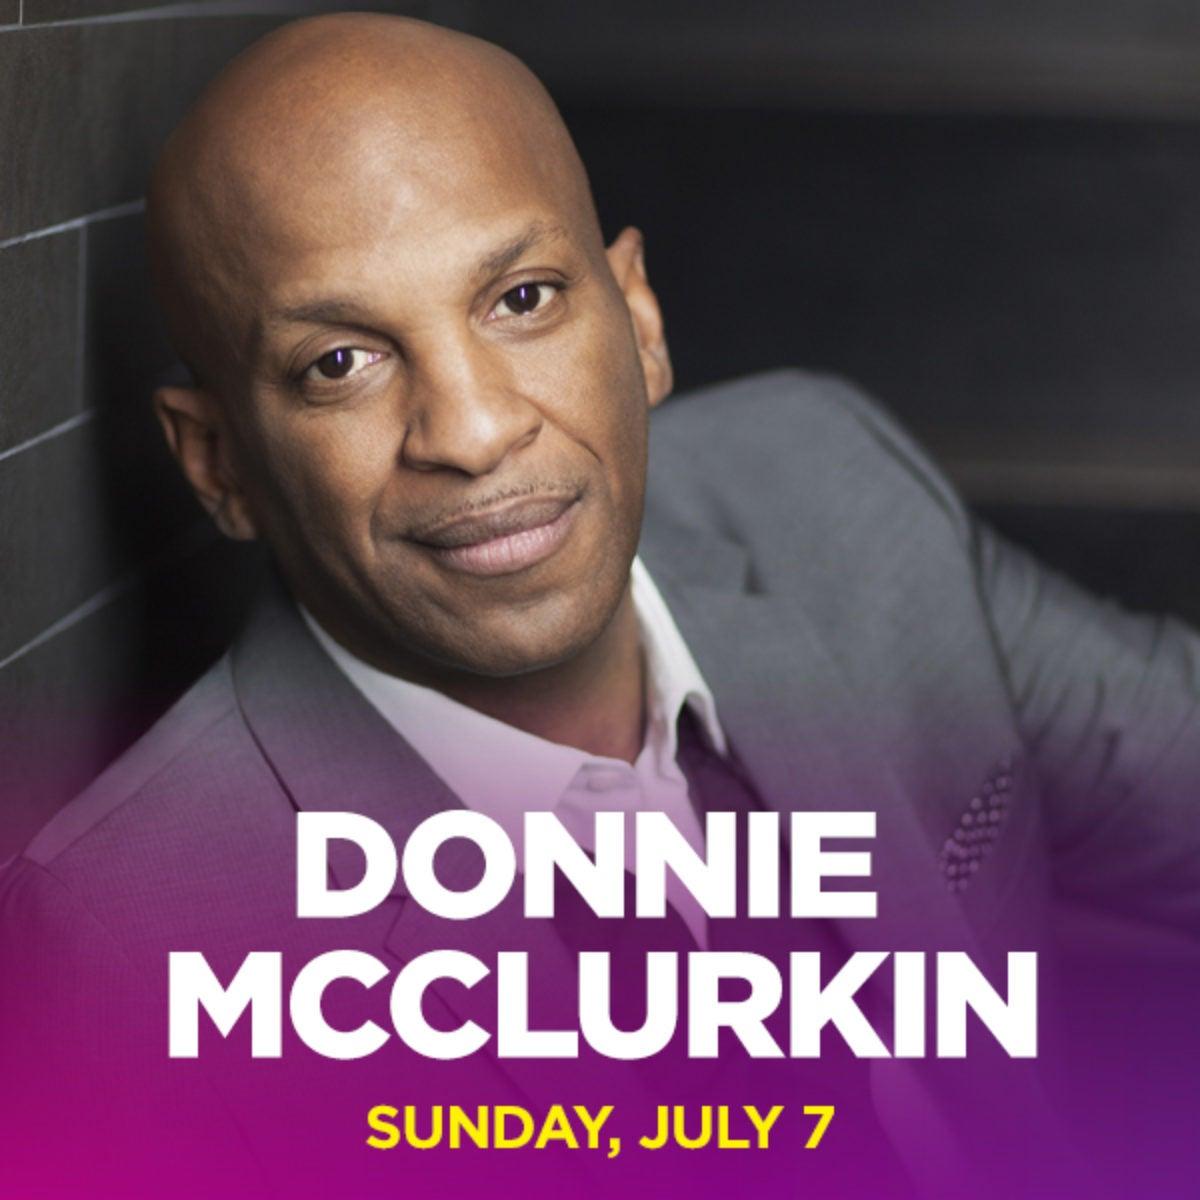 Donnie Mcclurkin S Children: ESSENCE Fest: Yolanda Adams, Donnie McClurkin, Tasha Cobbs